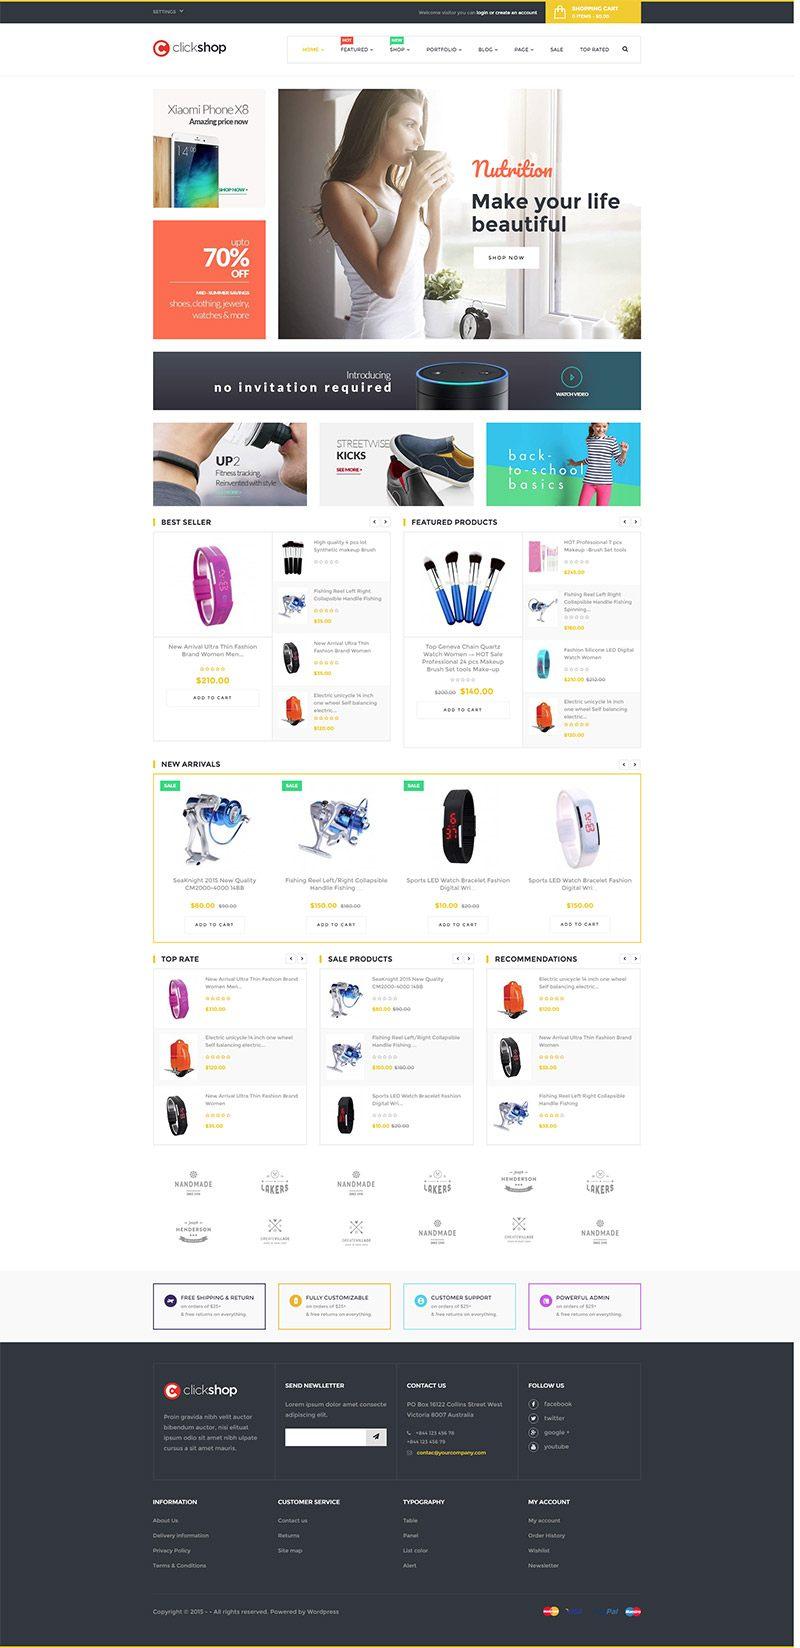 Giao-dien-website-thuong-mai-dien-tu-click-shop